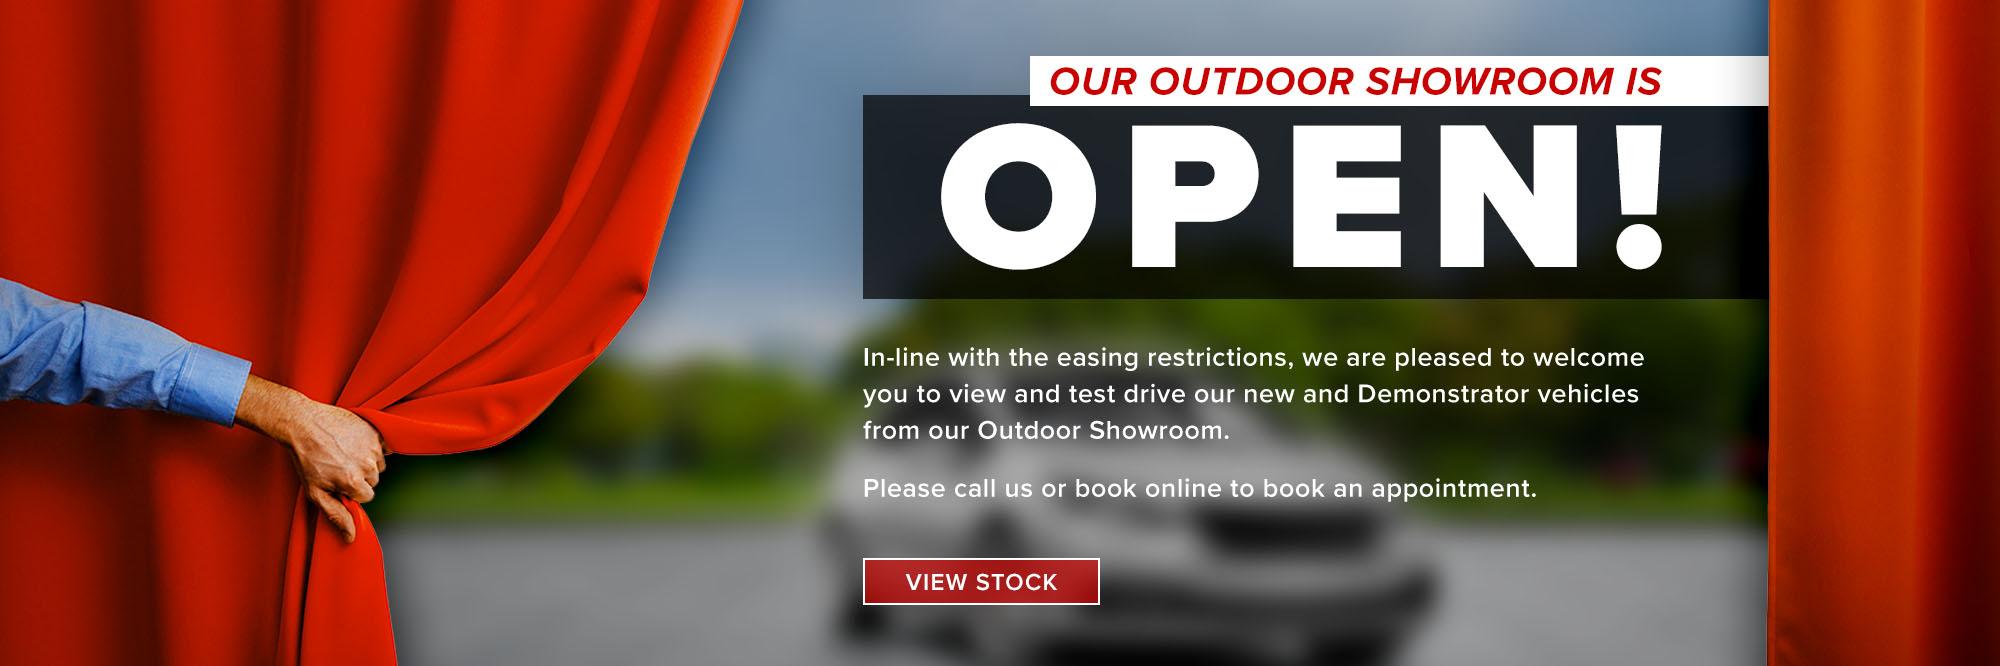 Our outdoor showroom is open. View stock.